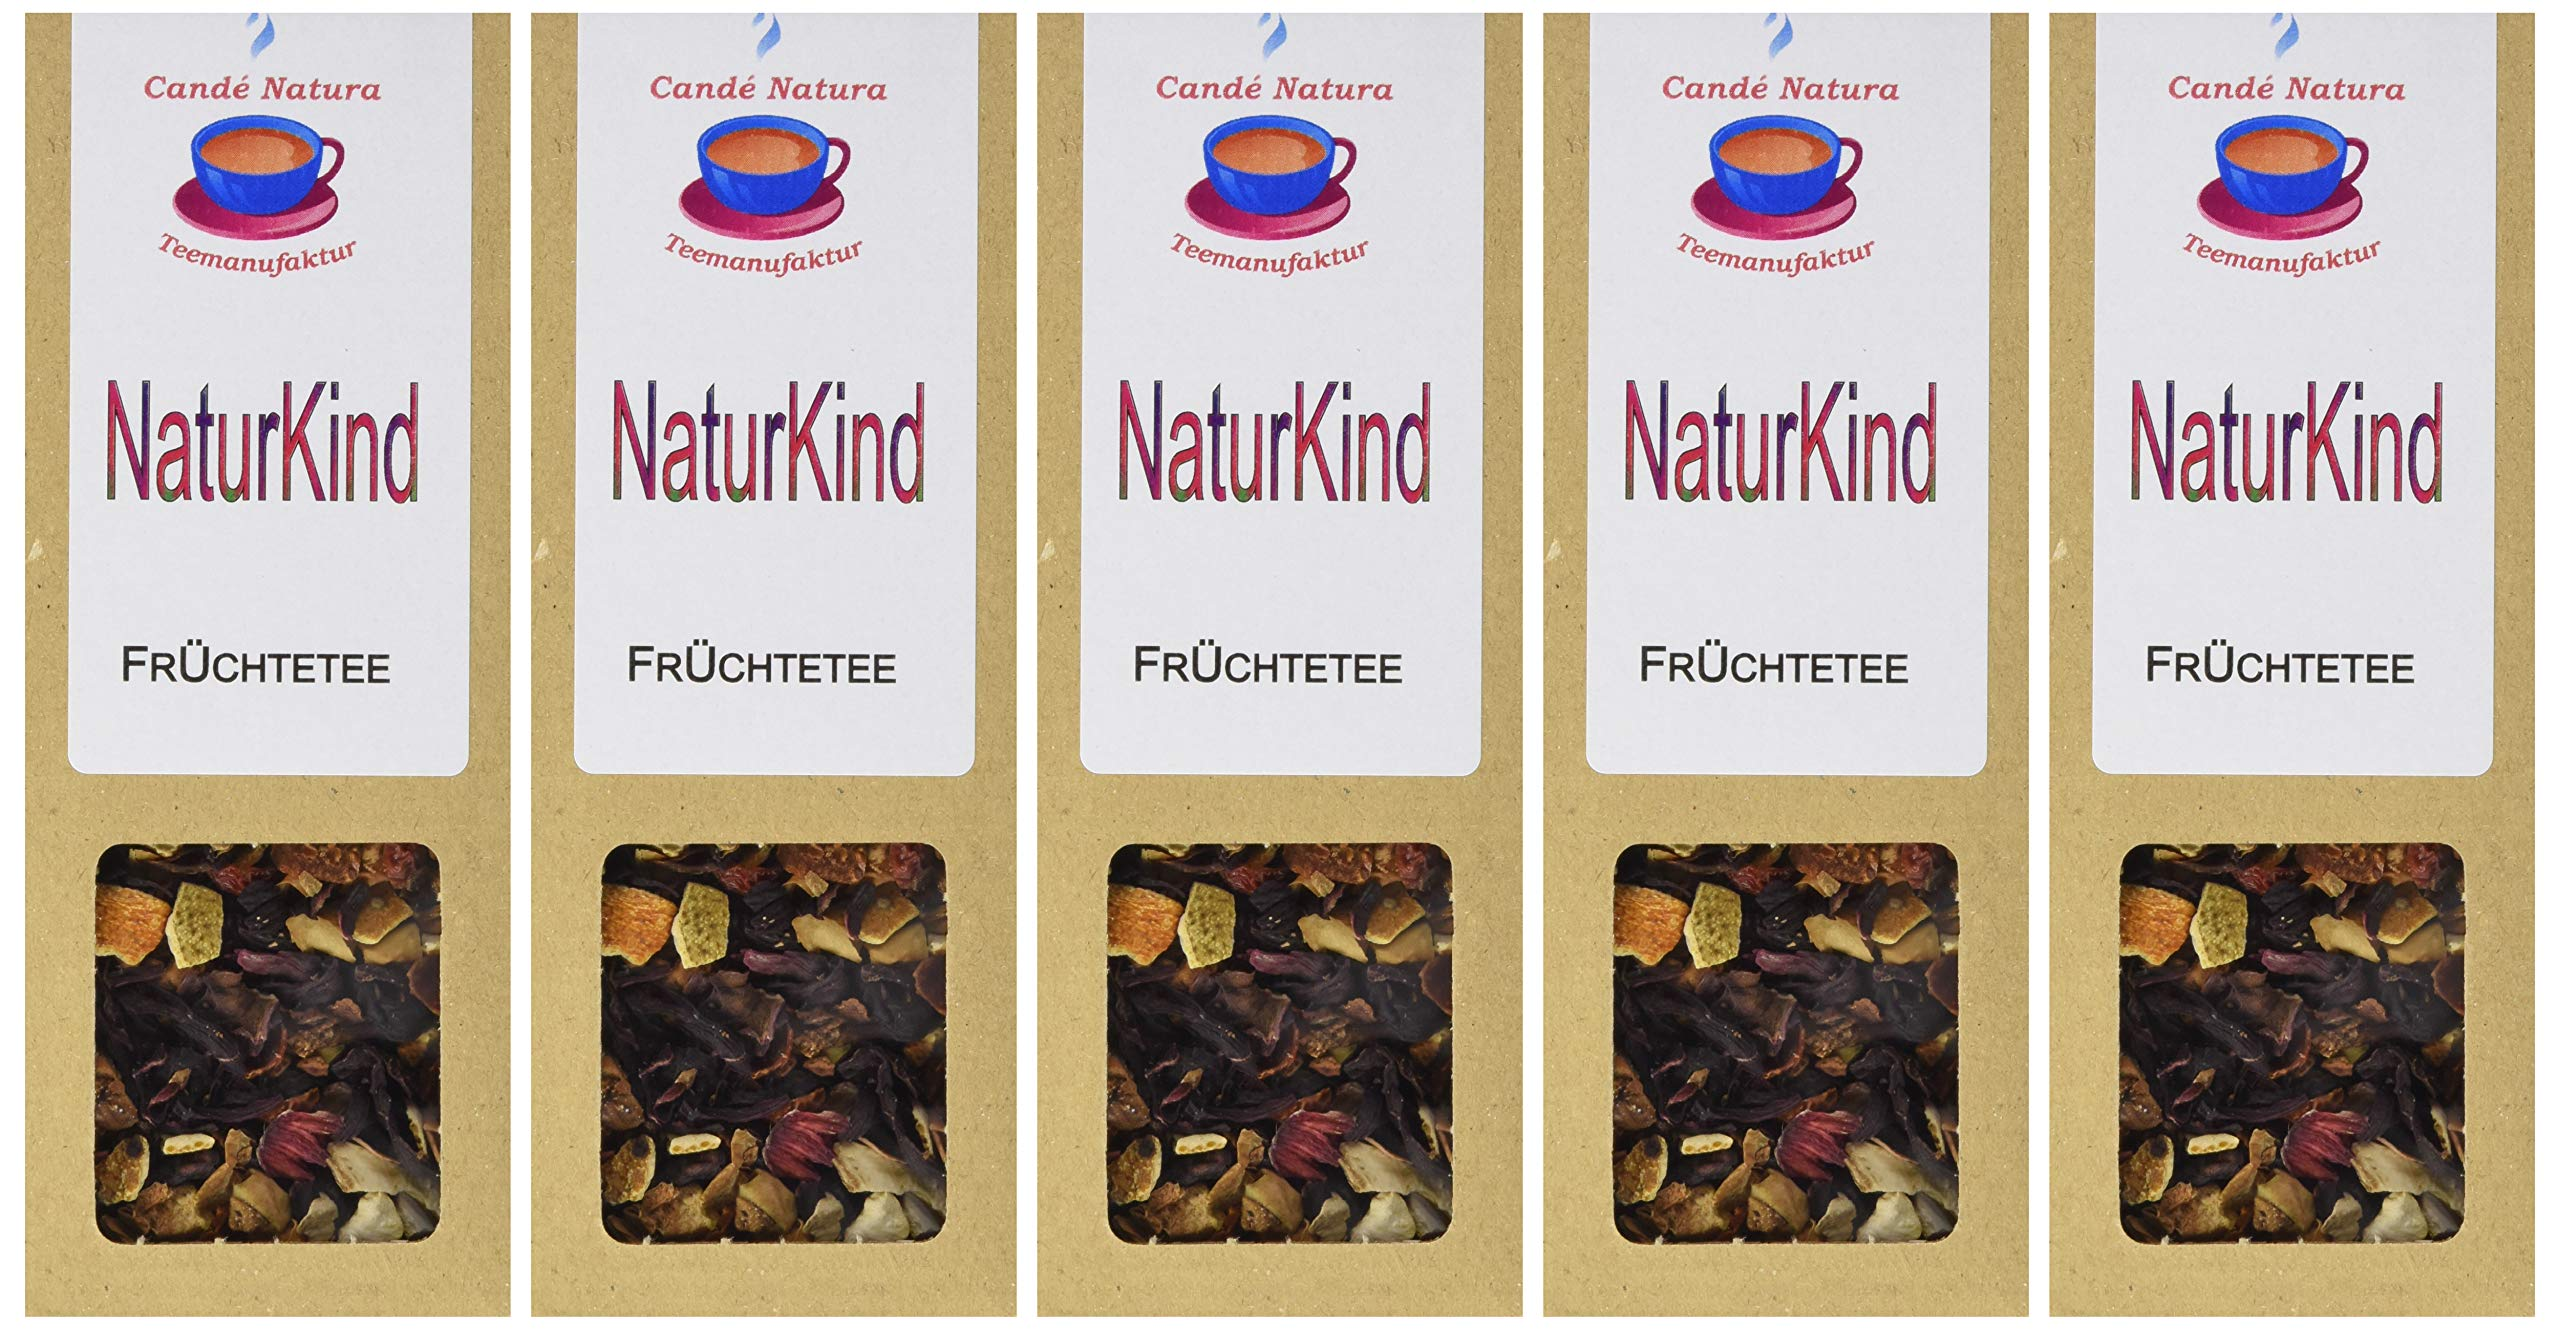 Cand-Natura-Teemanufaktur-Naturkind-Fruechteteemischung-5er-Pack-5-x-100-g